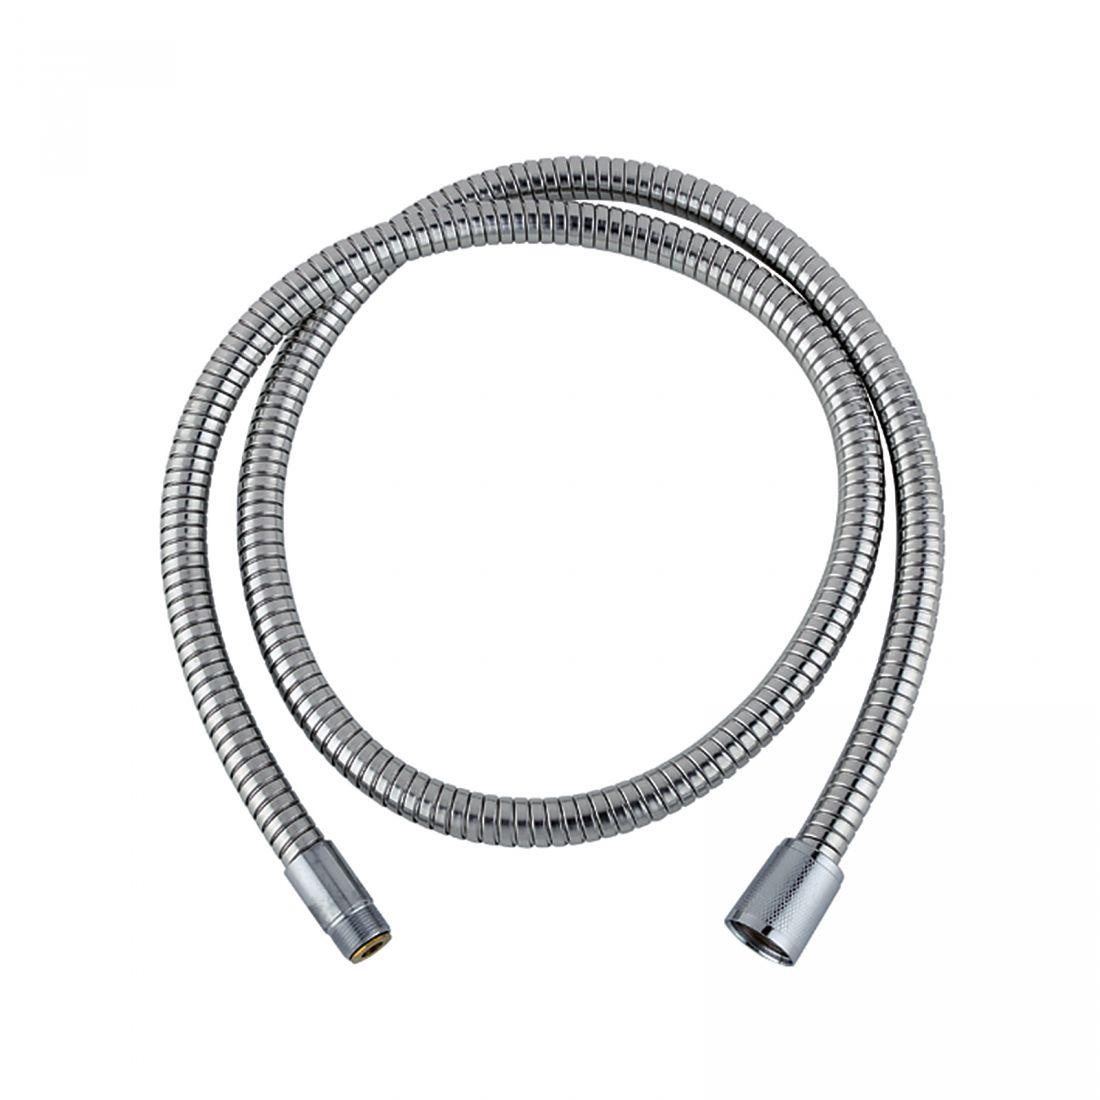 Шланг для кухни Timo 1,2-1,5mm (SH103 chrome)